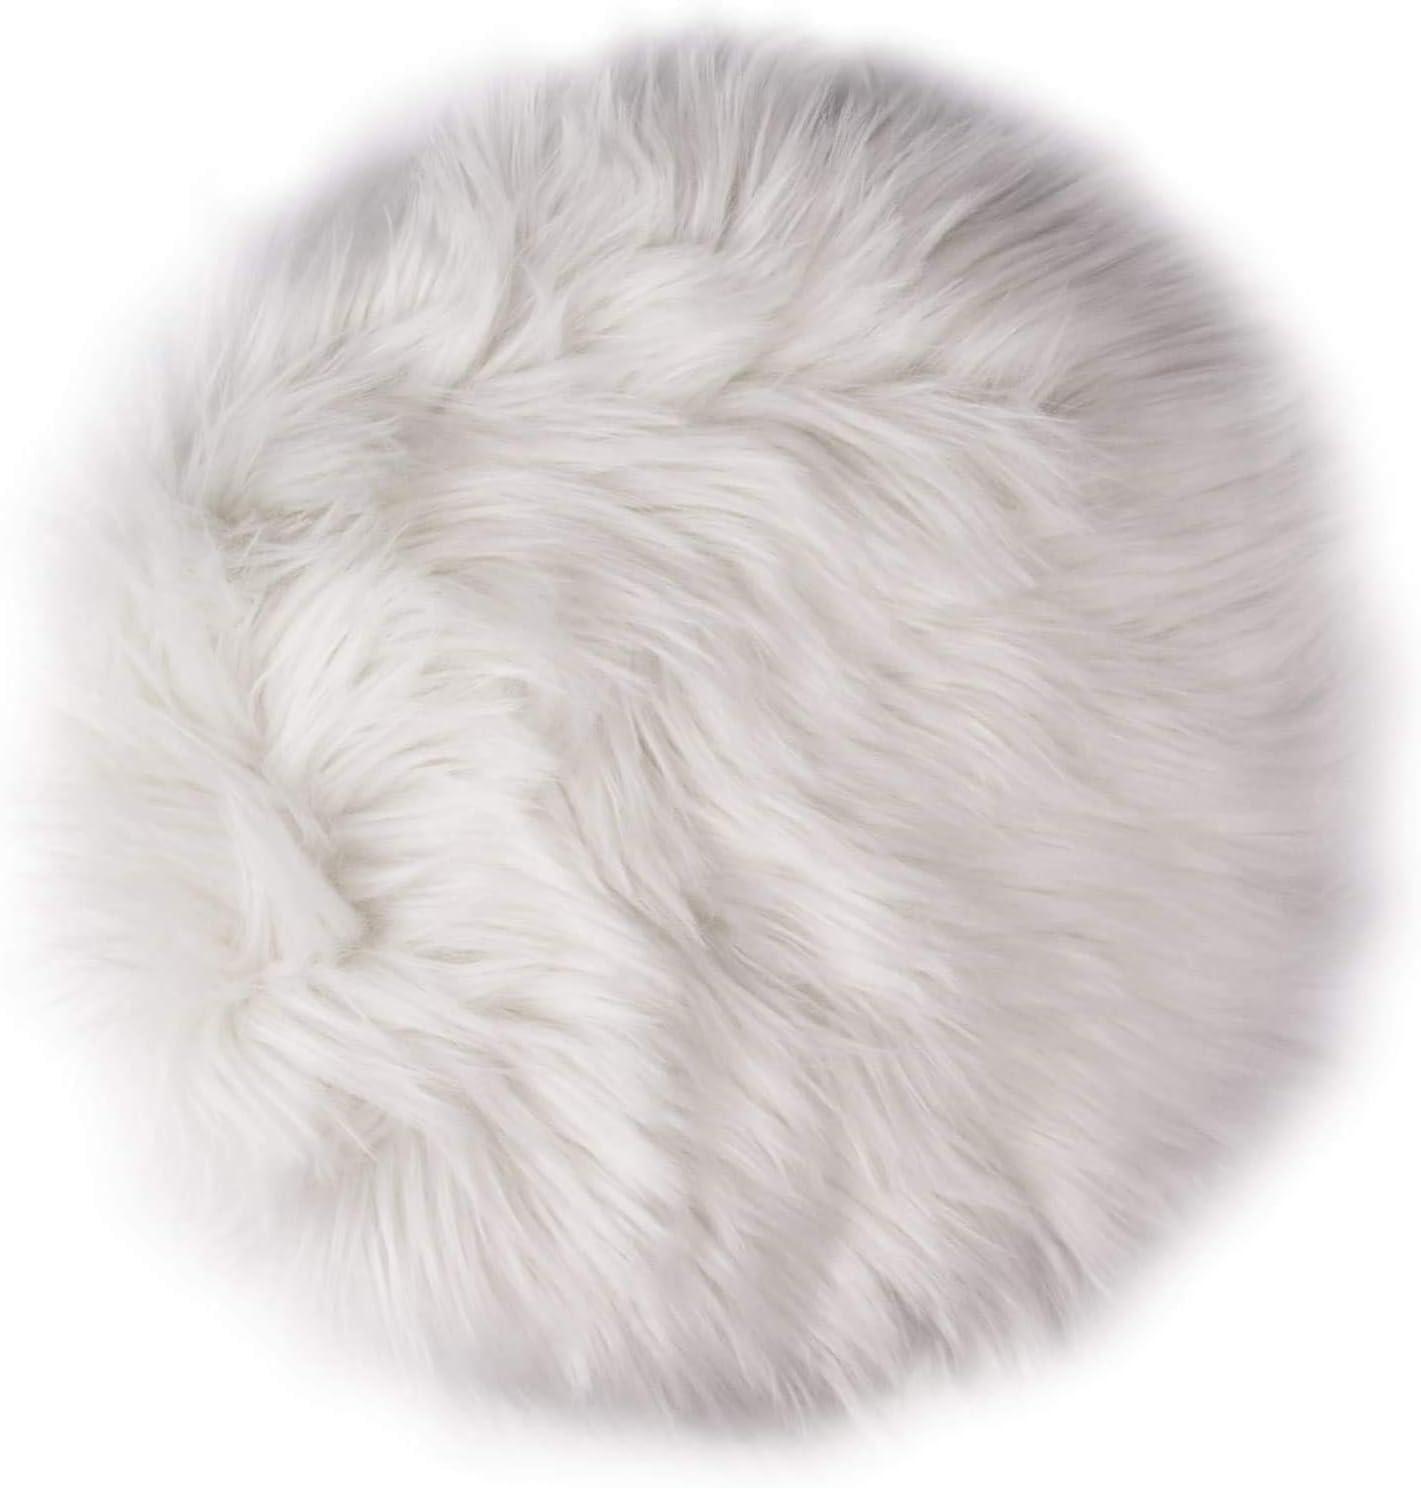 12 Fresno Mall Inches Cheap Mini Round Faux Fur Sheepskin Fluffy Room Living Rugs